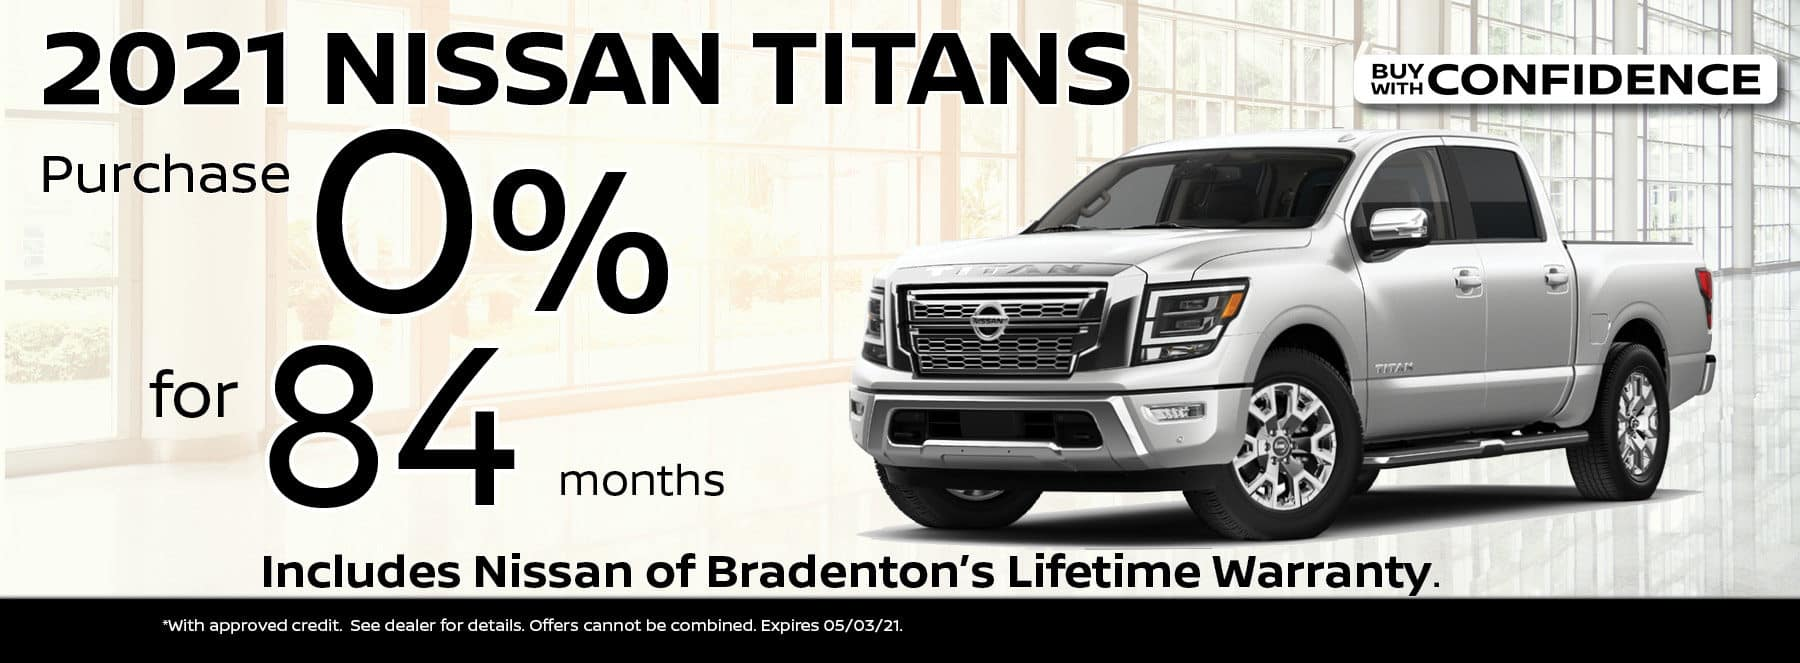 2021 Titans zero percent